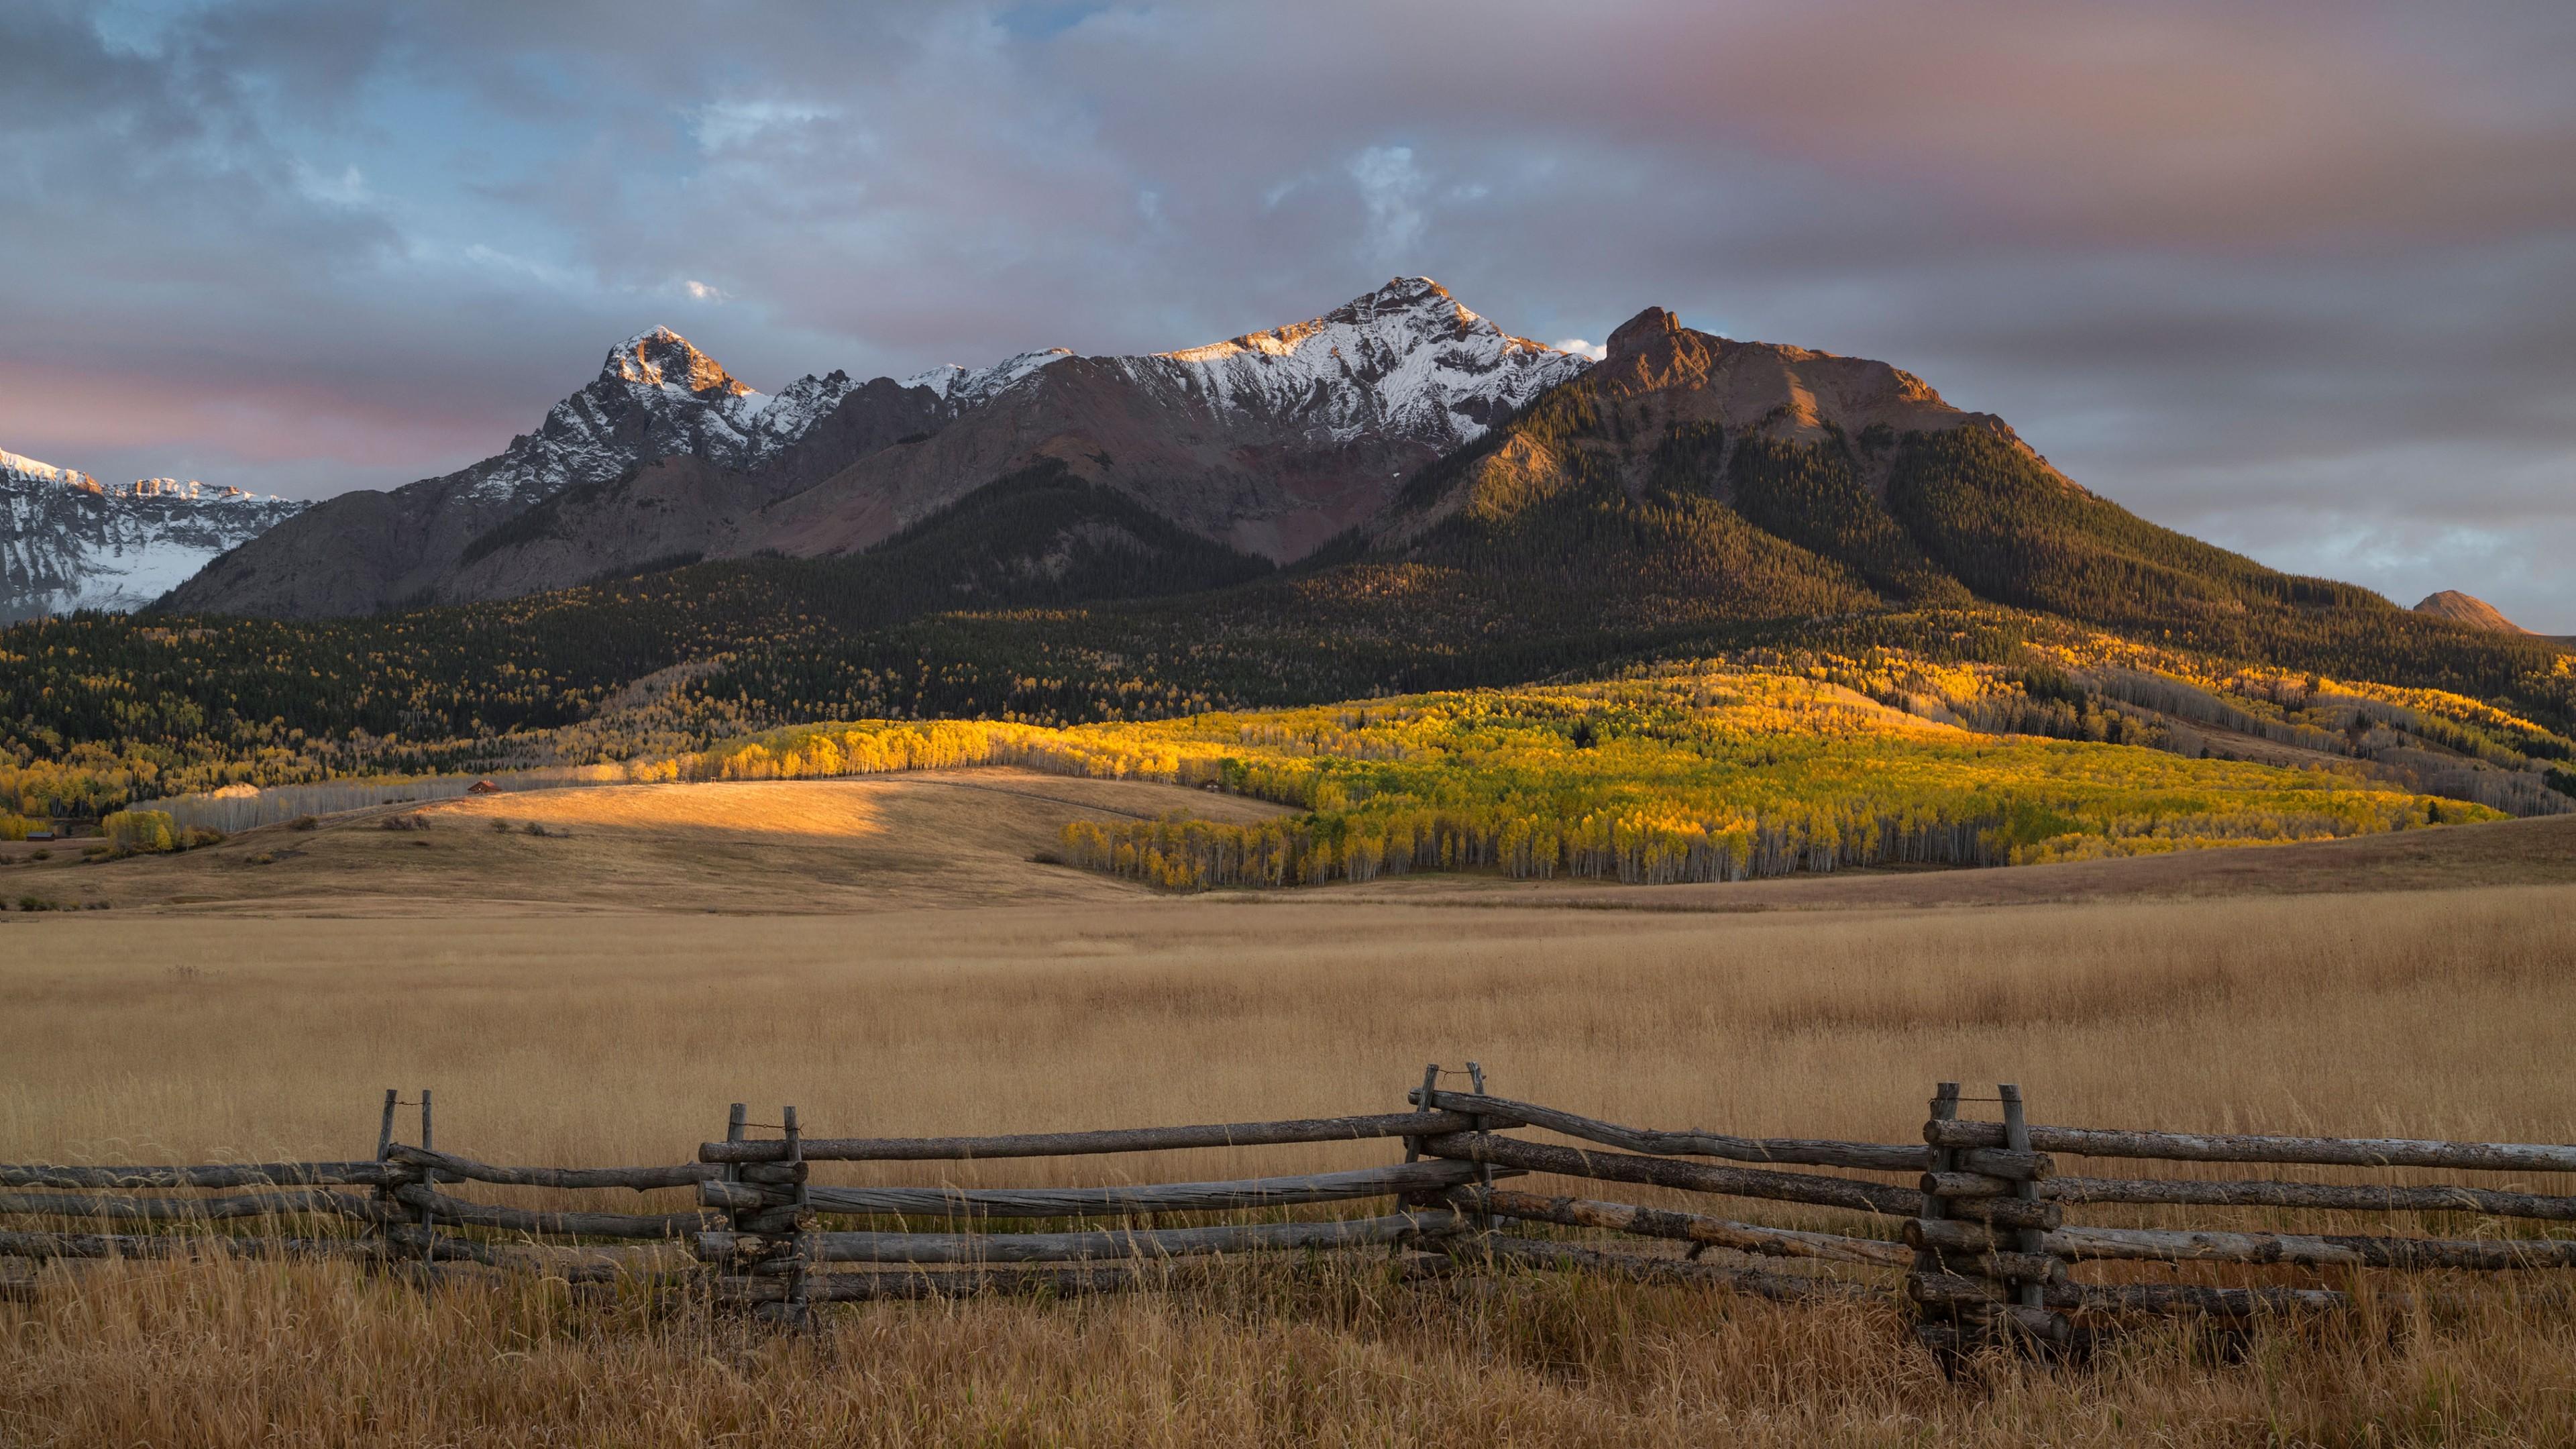 Wallpaper Field Mountains Usa Colorado 4k Nature 16243